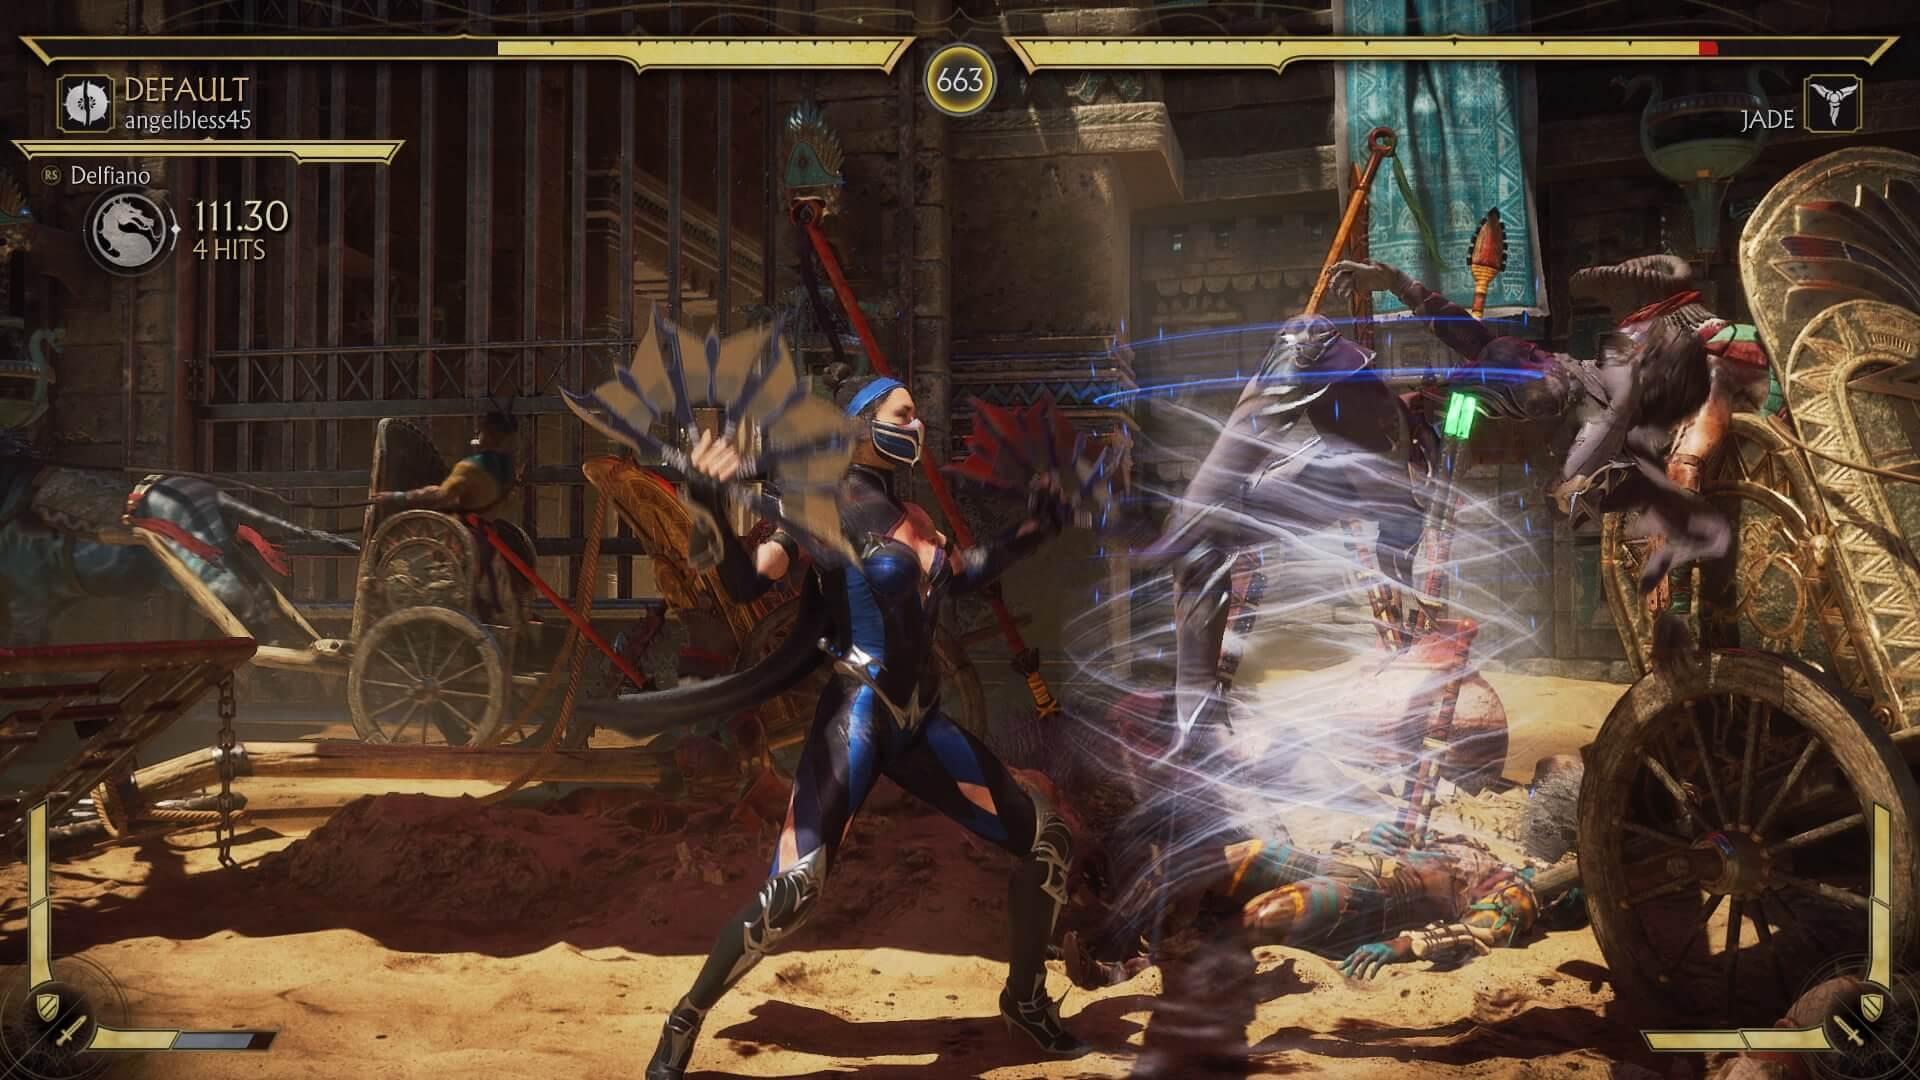 Análise Mortal Kombat 11, Mortal Kombat 11, Mortal Kombat, NetherRealm Studios, Warner, WBIE, Delfos